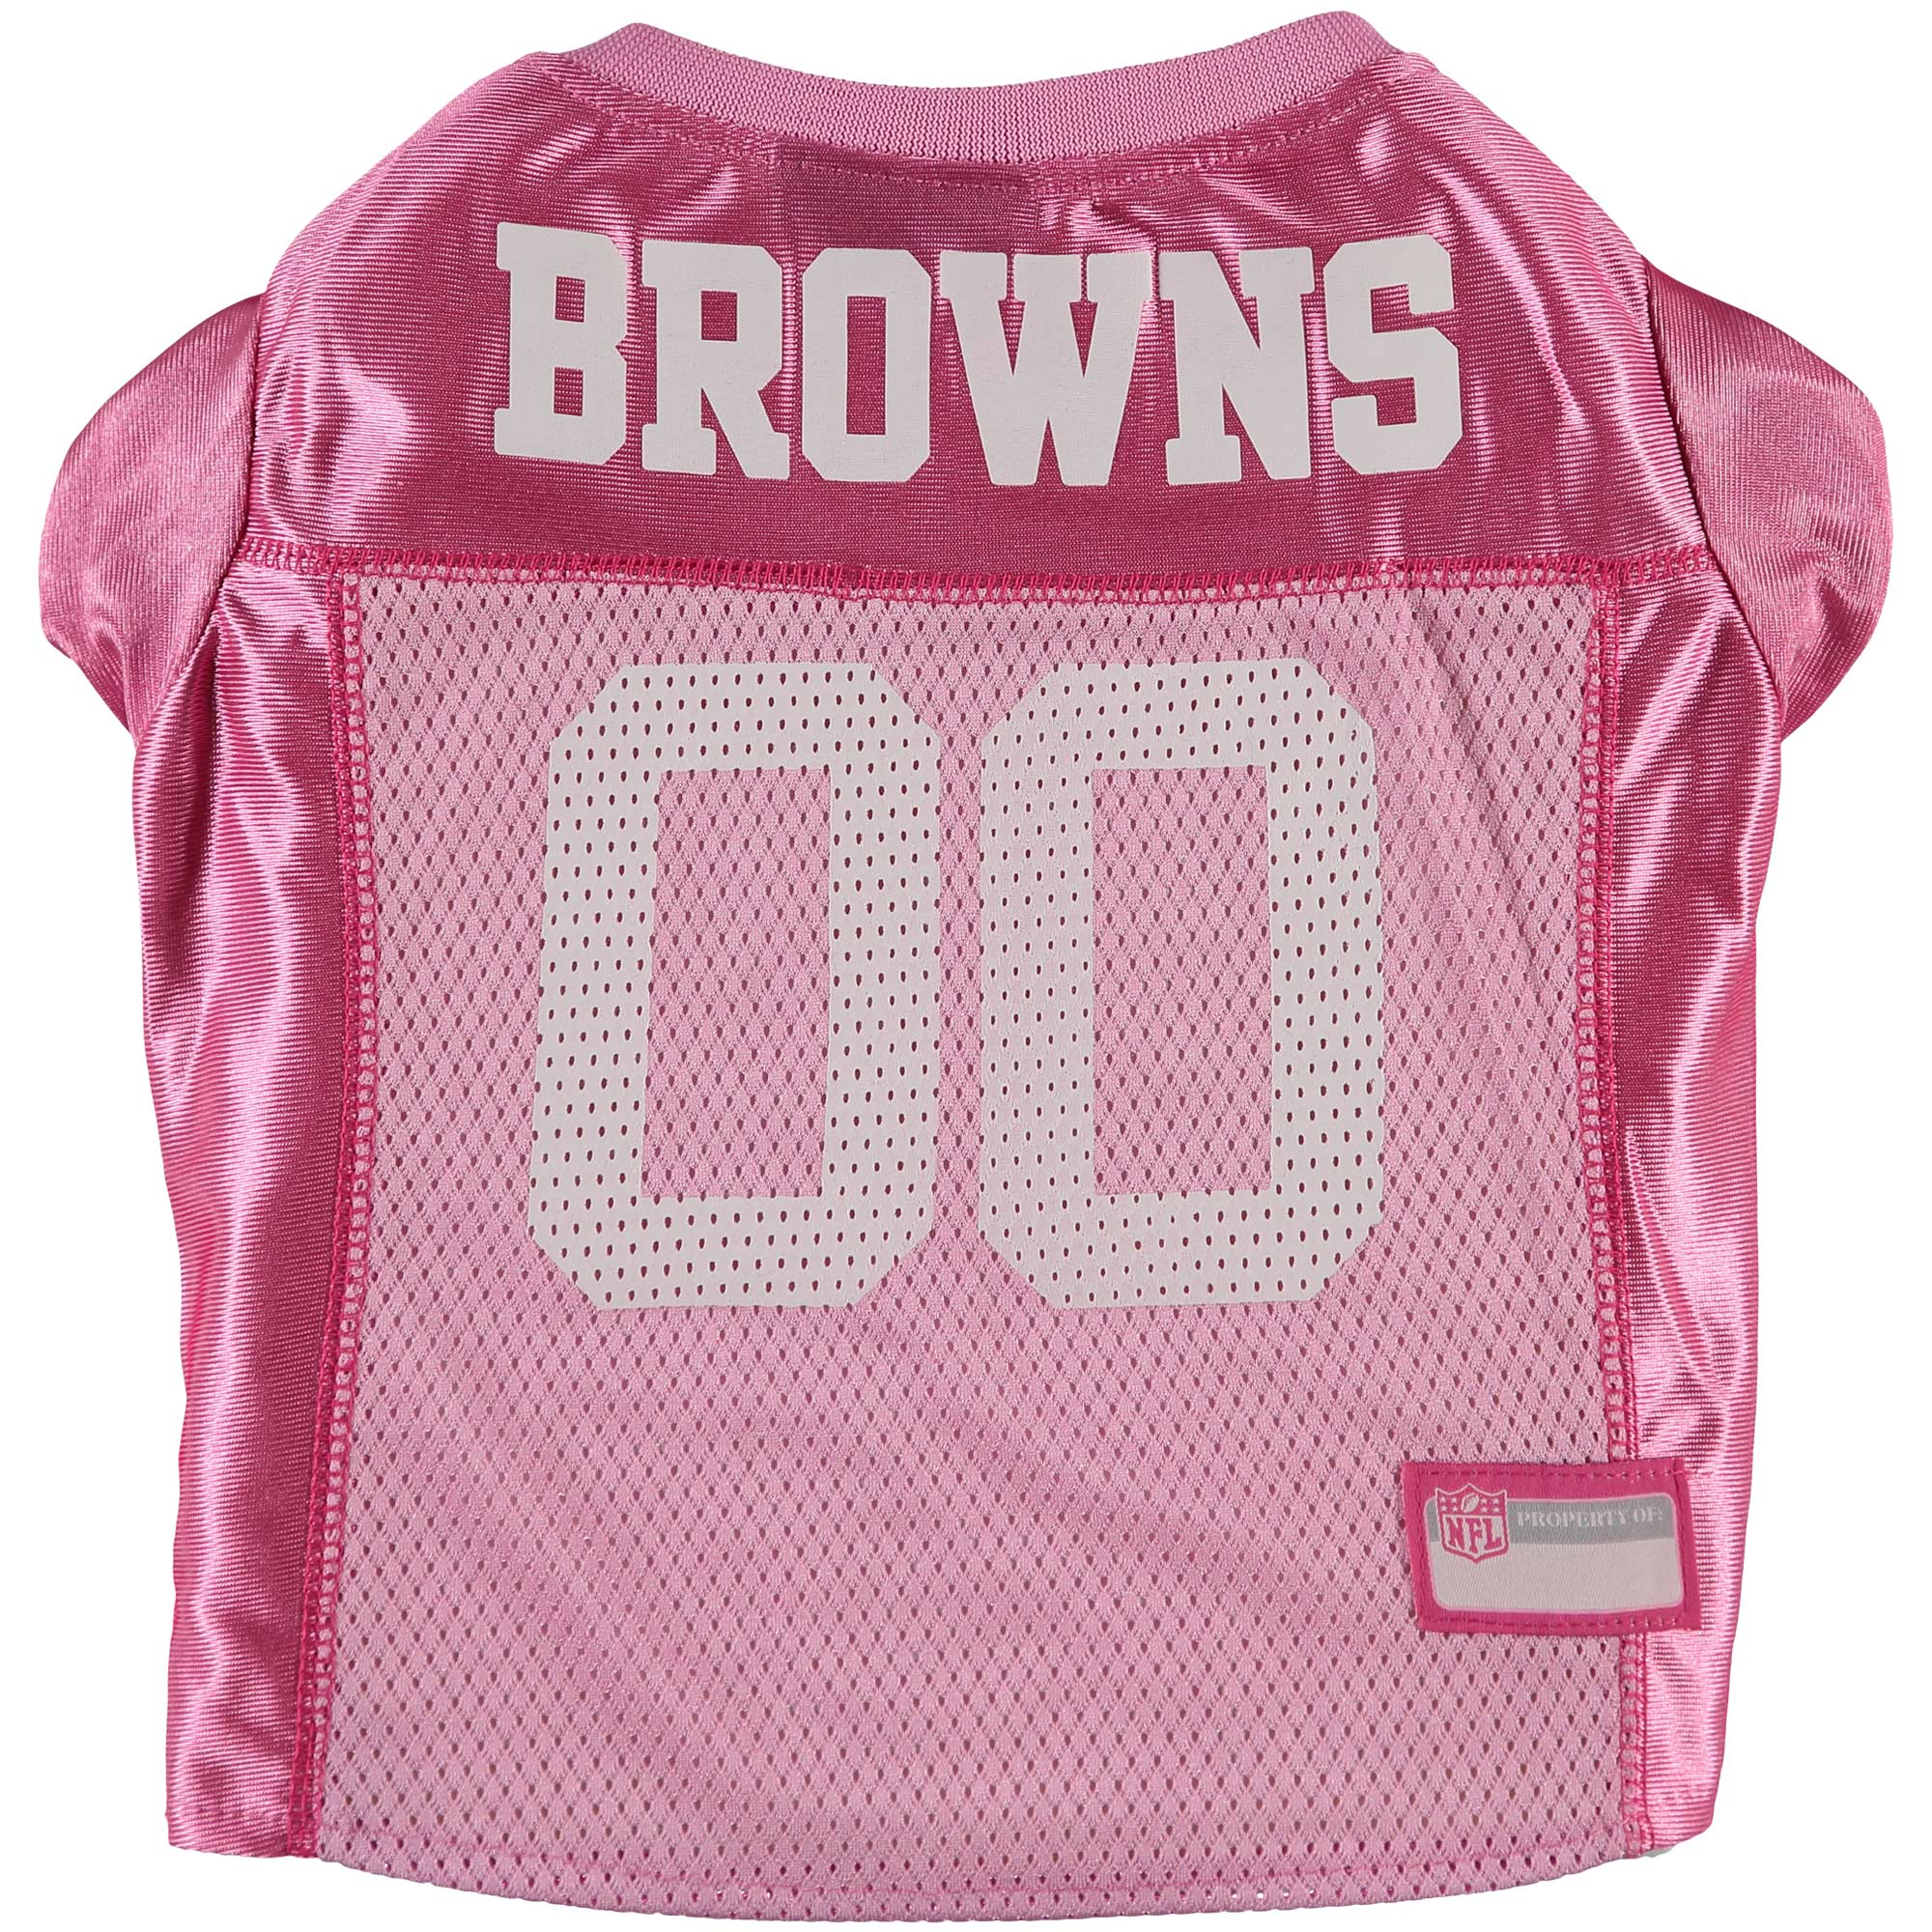 Cleveland Browns Mesh Dog Jersey - Pink